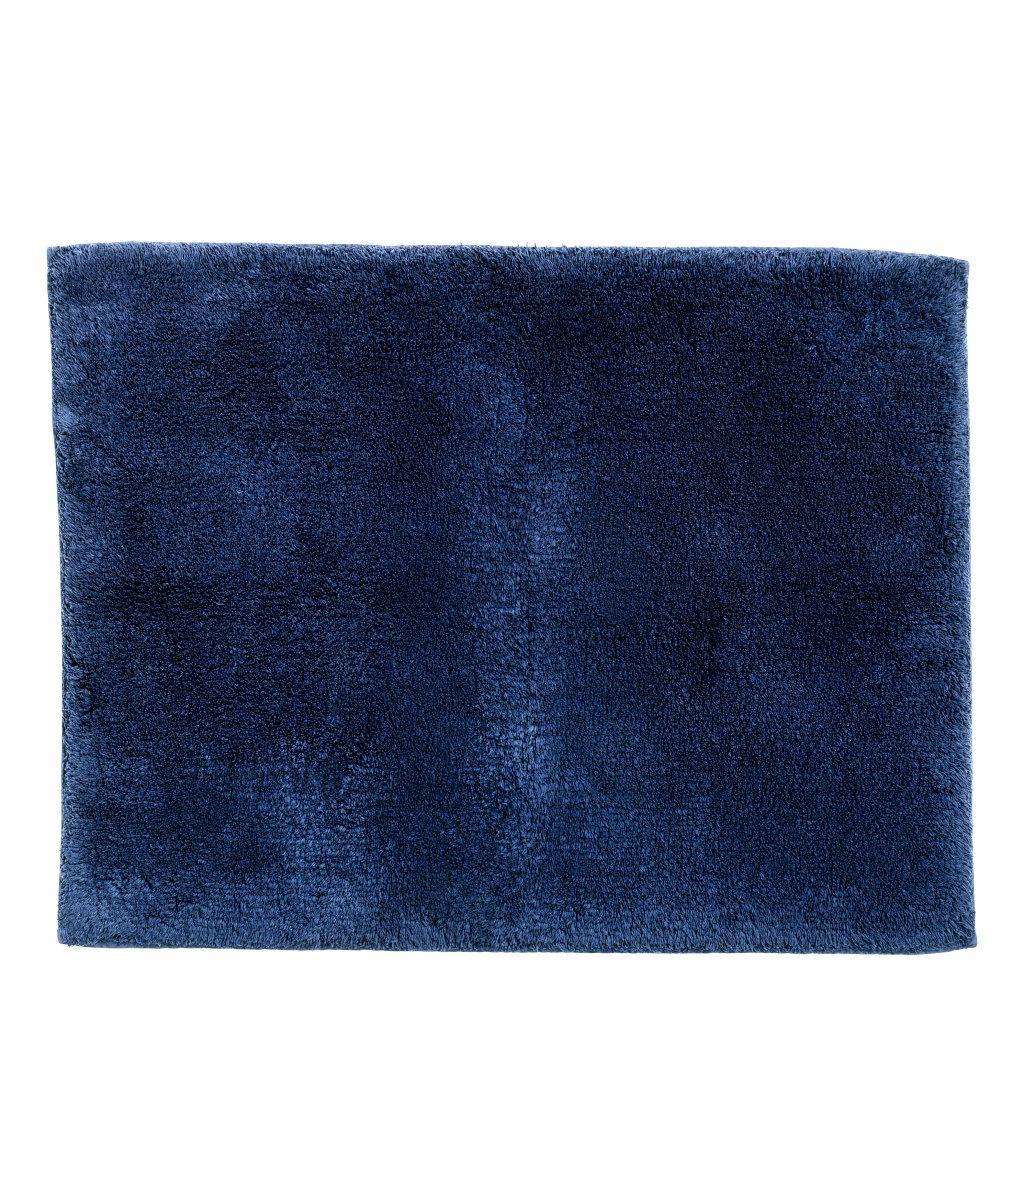 badematte | mørk blå | home | h&m no | interior | room | living, Badezimmer ideen